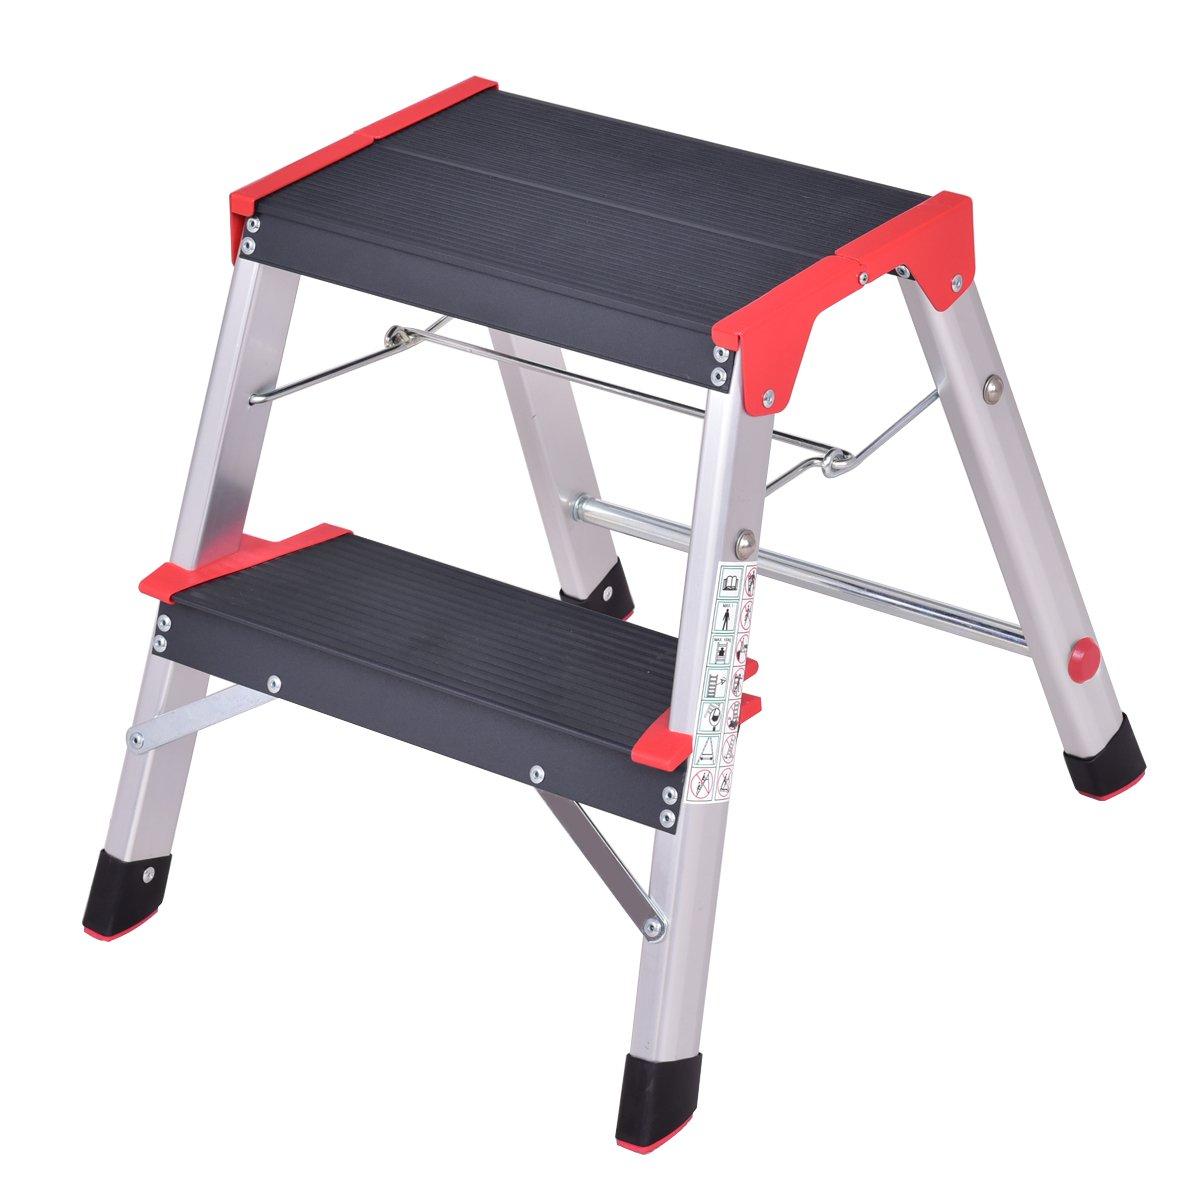 Giantex Aluminum 2 Step Ladder Folding Non-Slip Lightweight 330lbs Capacity Platform Stool